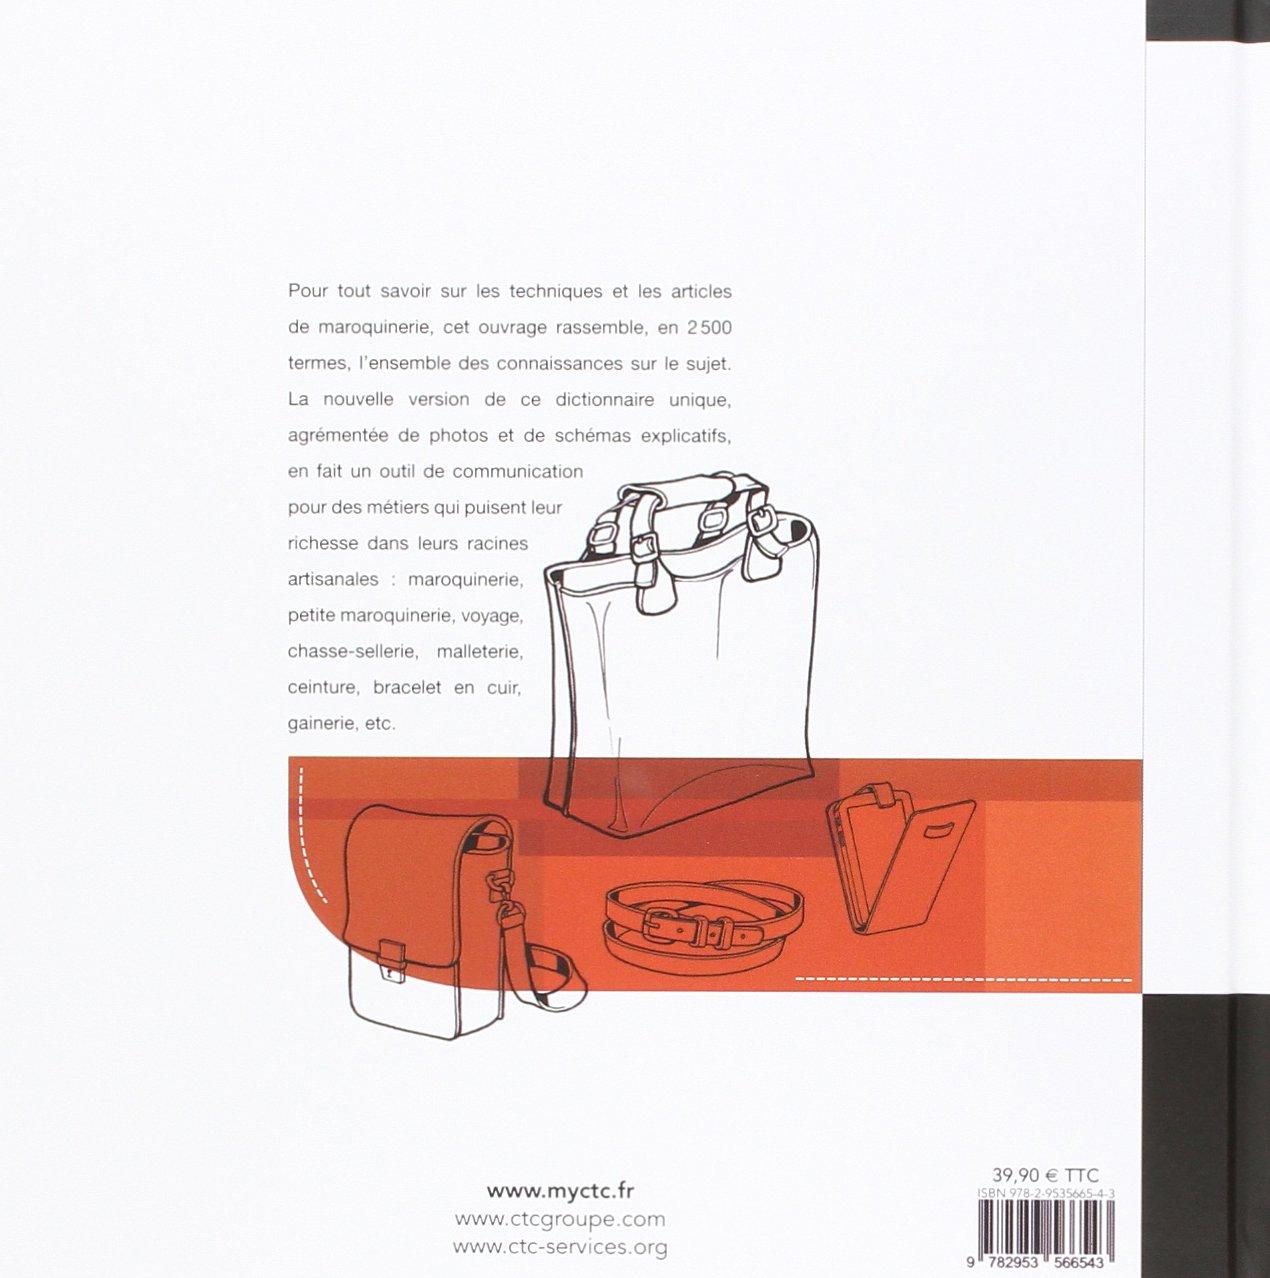 Dictionnaire technique de la maroquinerie Les indispensables de CTC: Amazon.es: CTC, Yves Morin: Libros en idiomas extranjeros